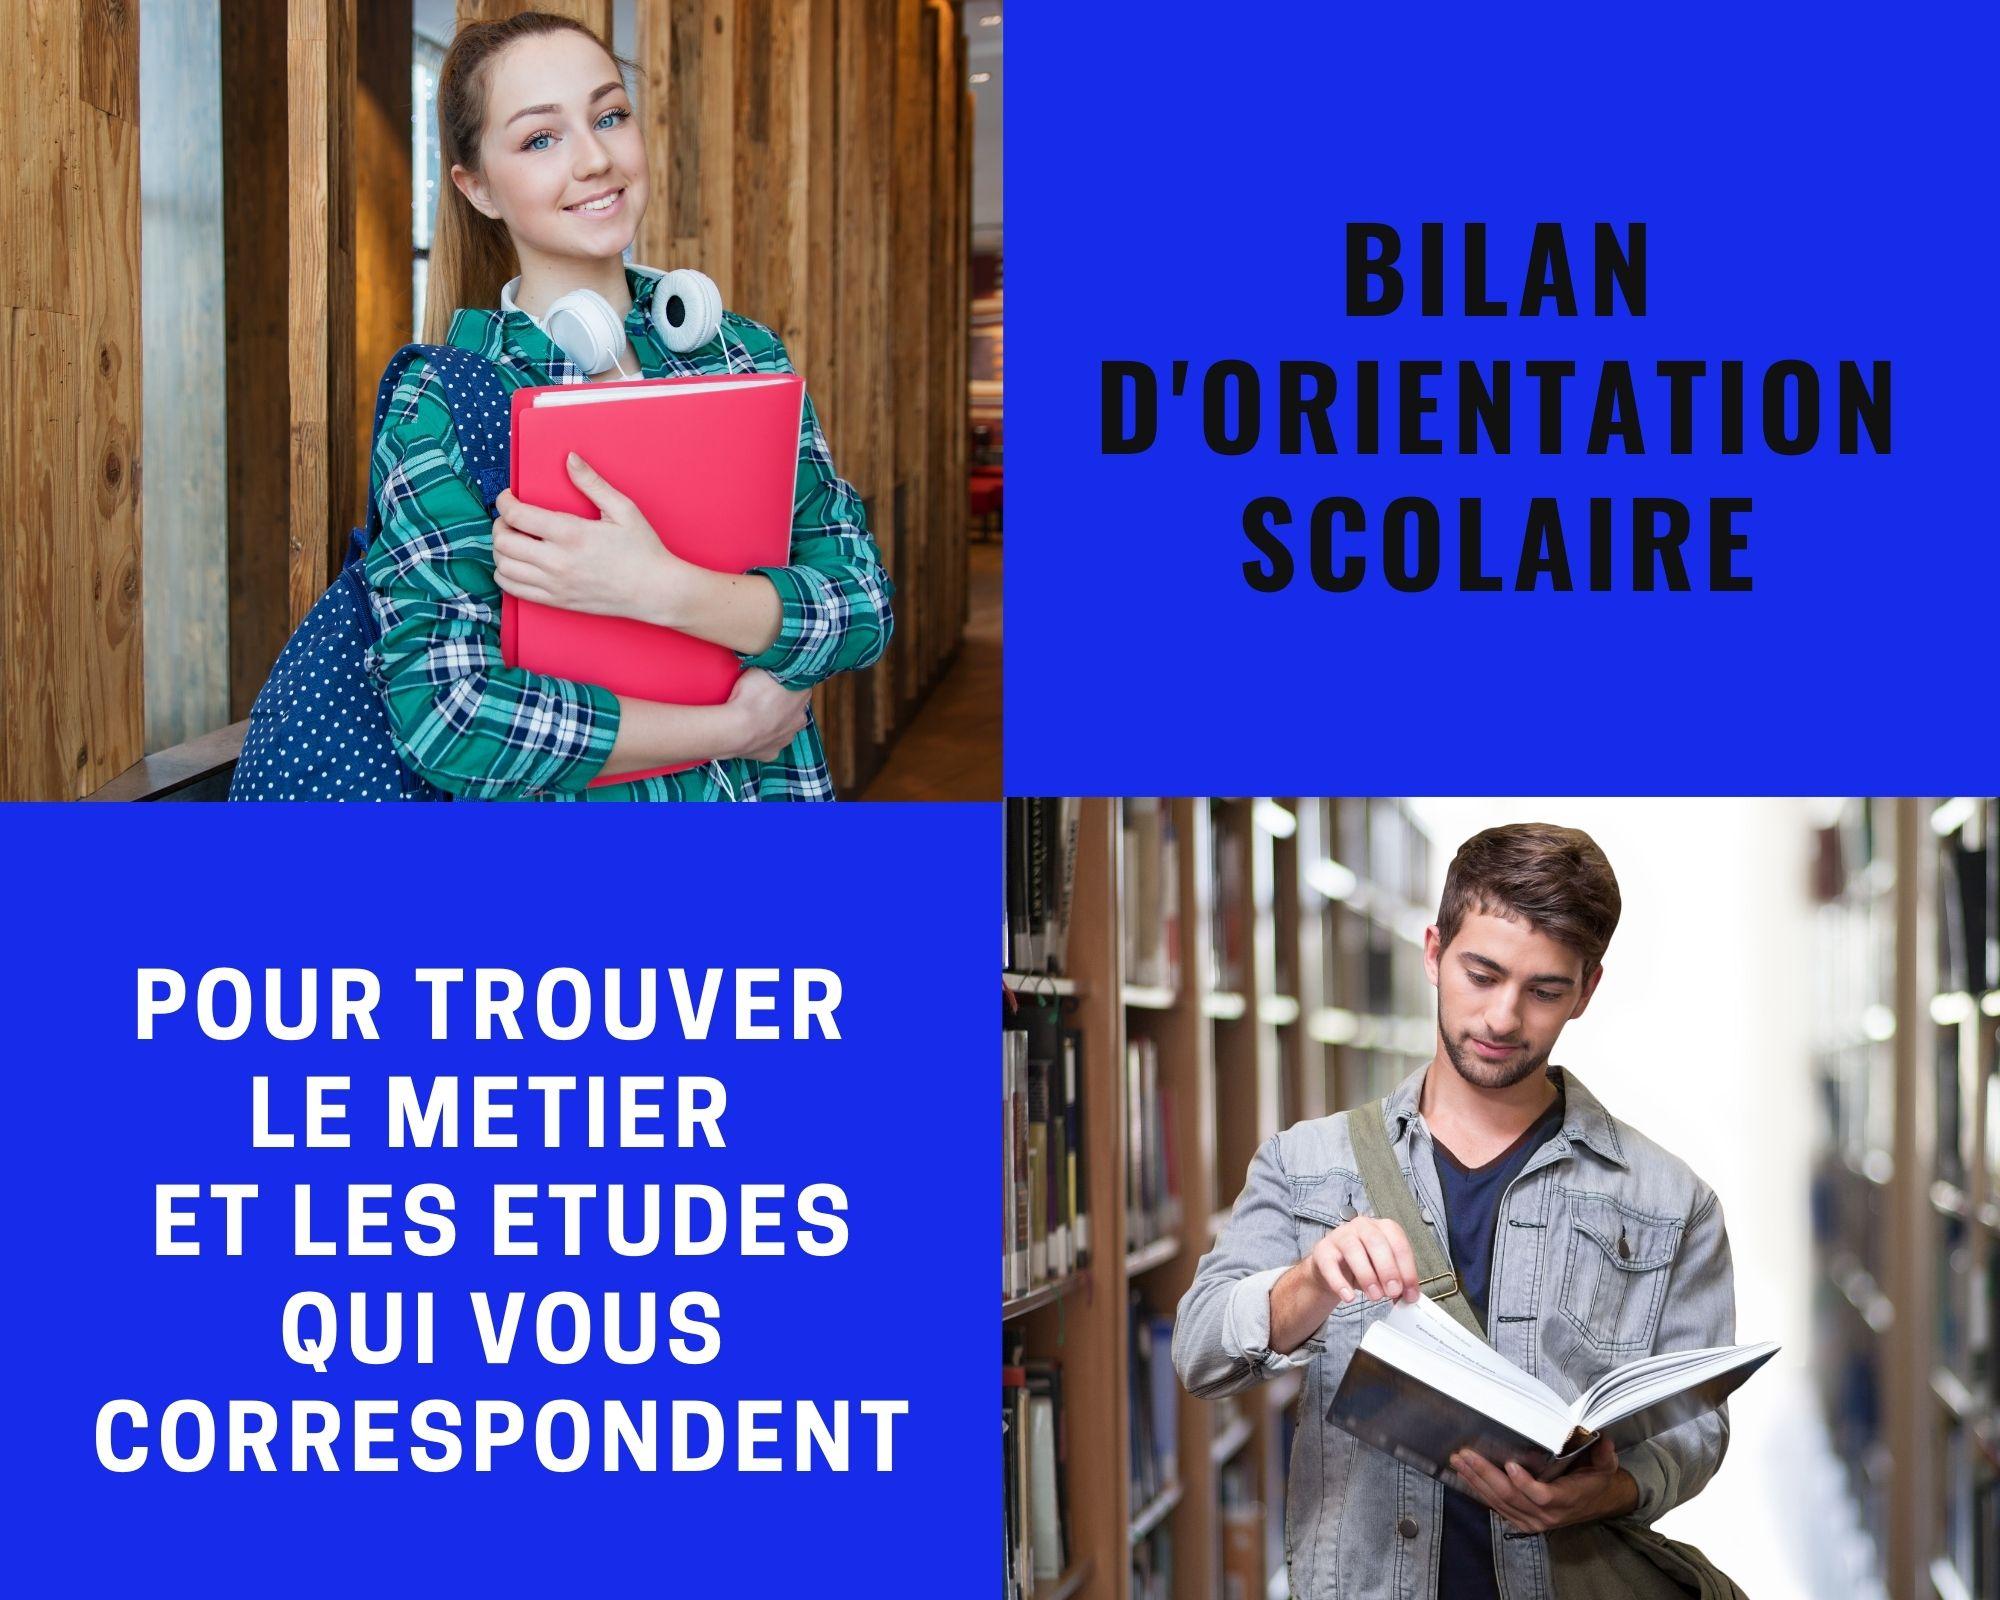 ✔ BILAN D'ORIENTATION